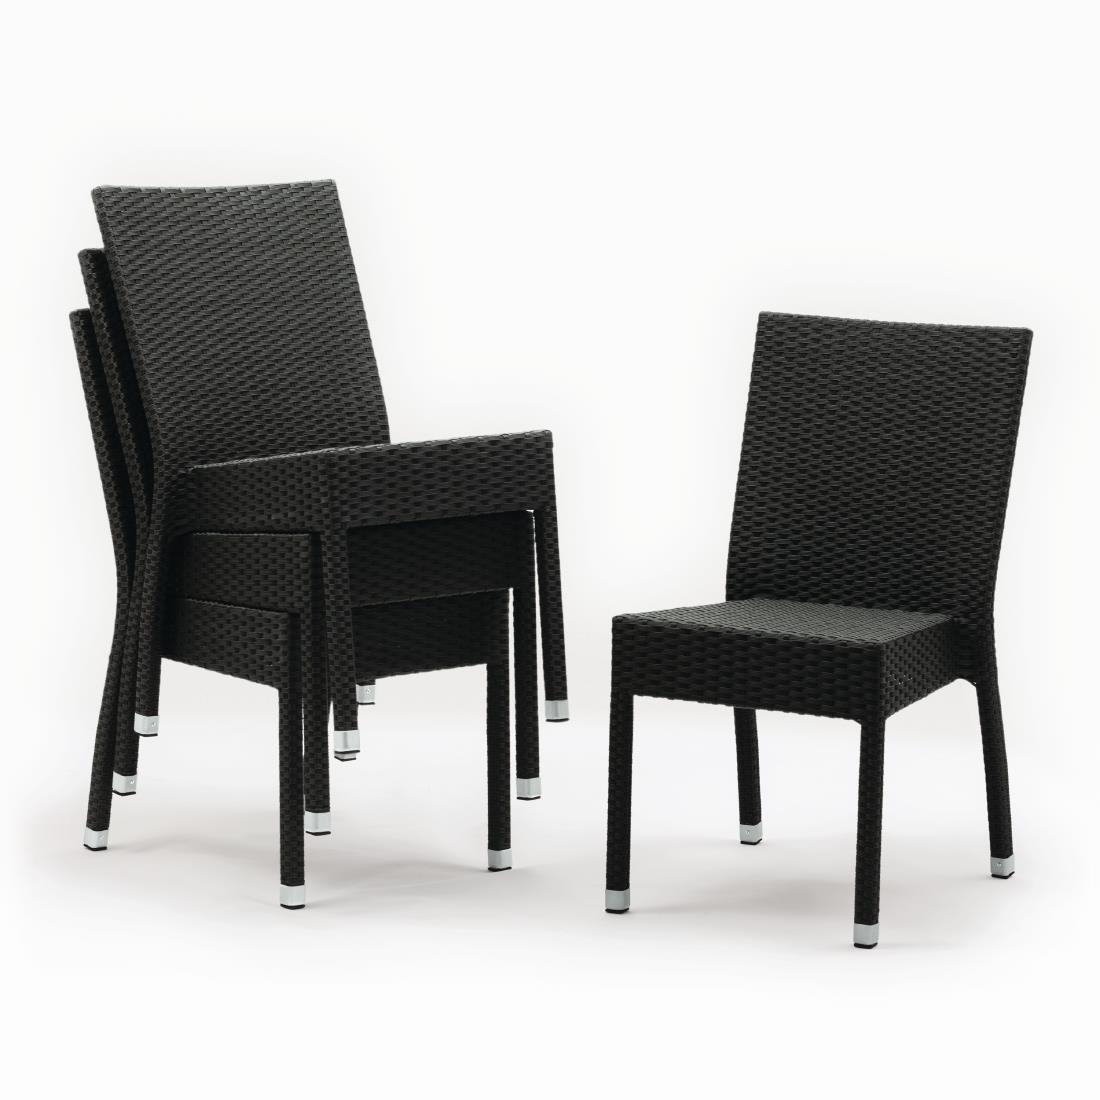 Rattan Side Chair CF15 - Charcoal